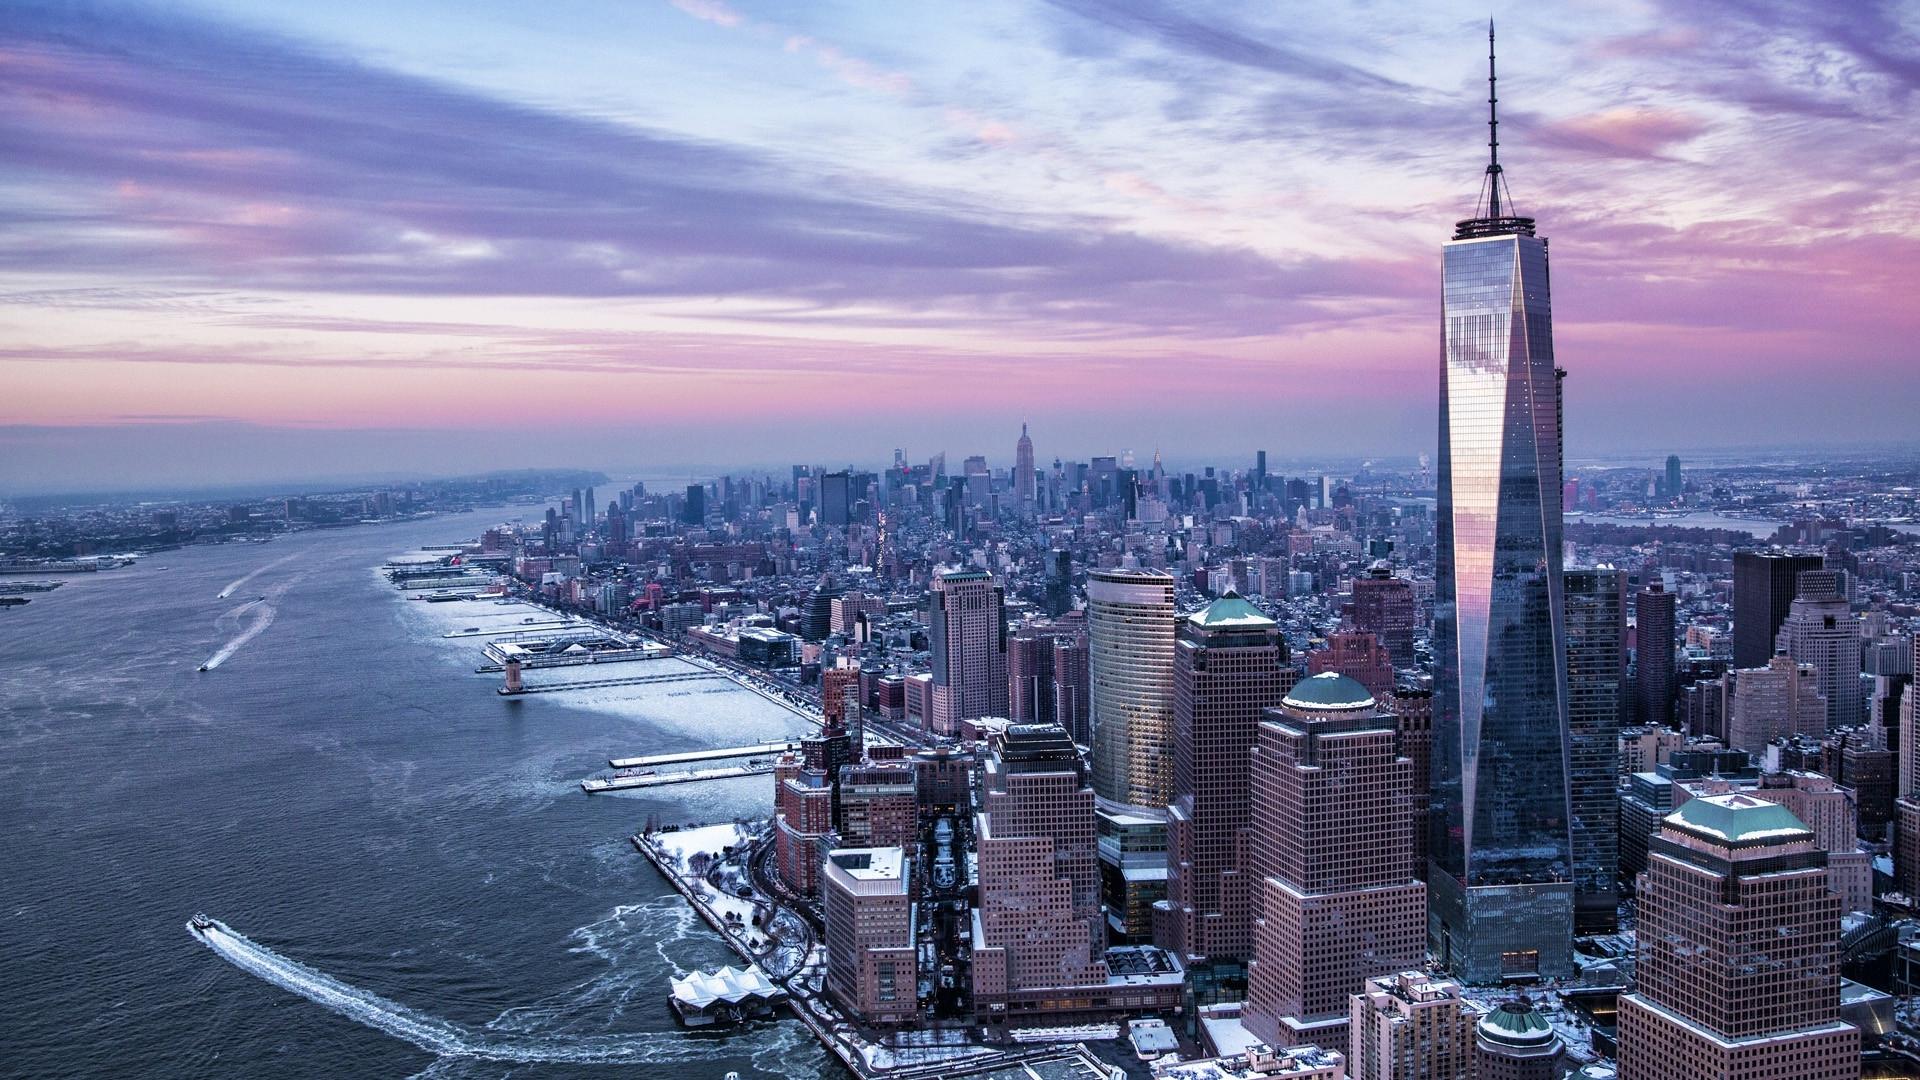 new york city wallpaper hd   pixelstalk